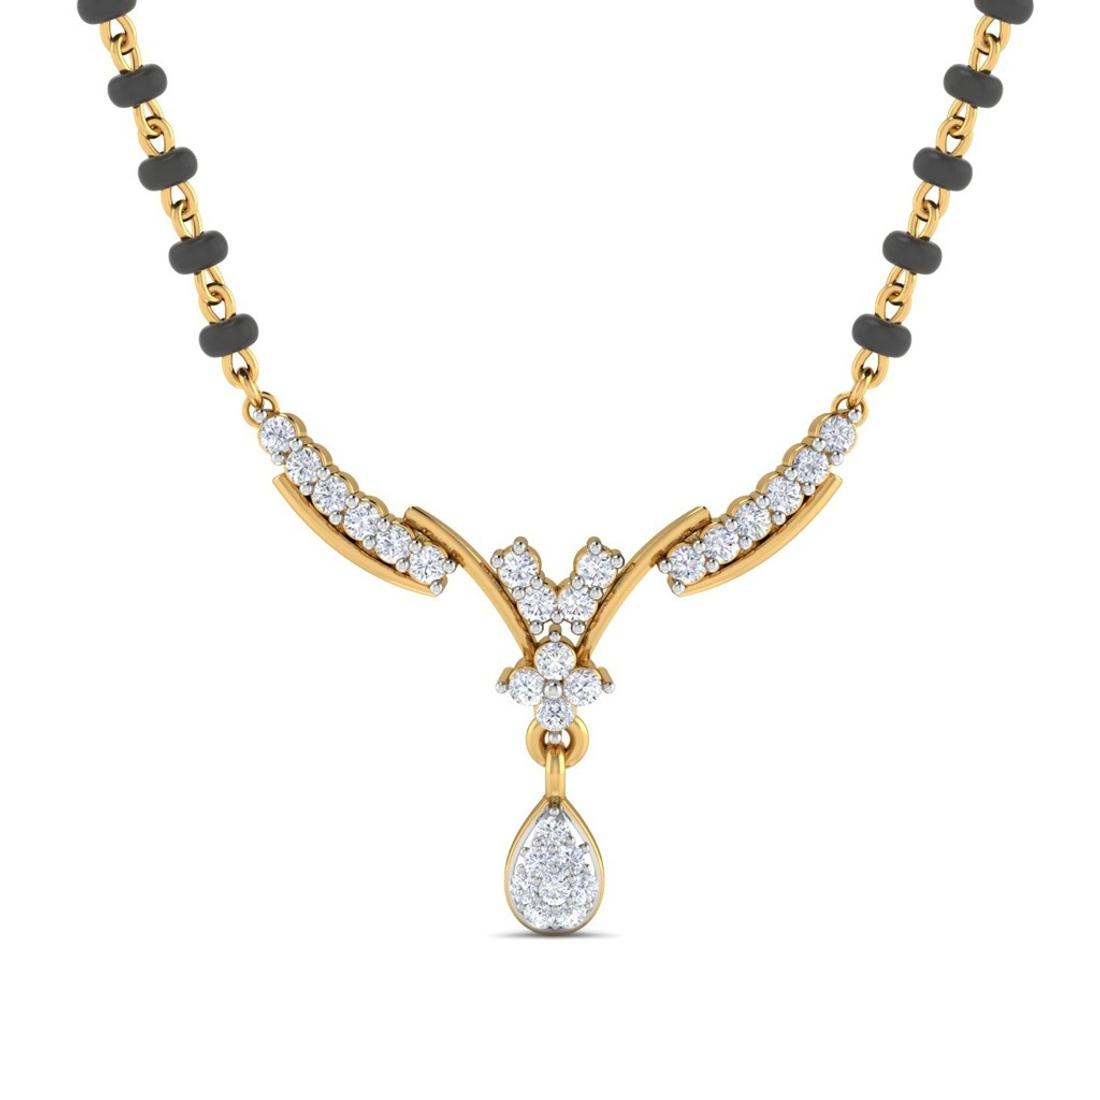 Sarvada Jewels' The Anushka Mangalsuta